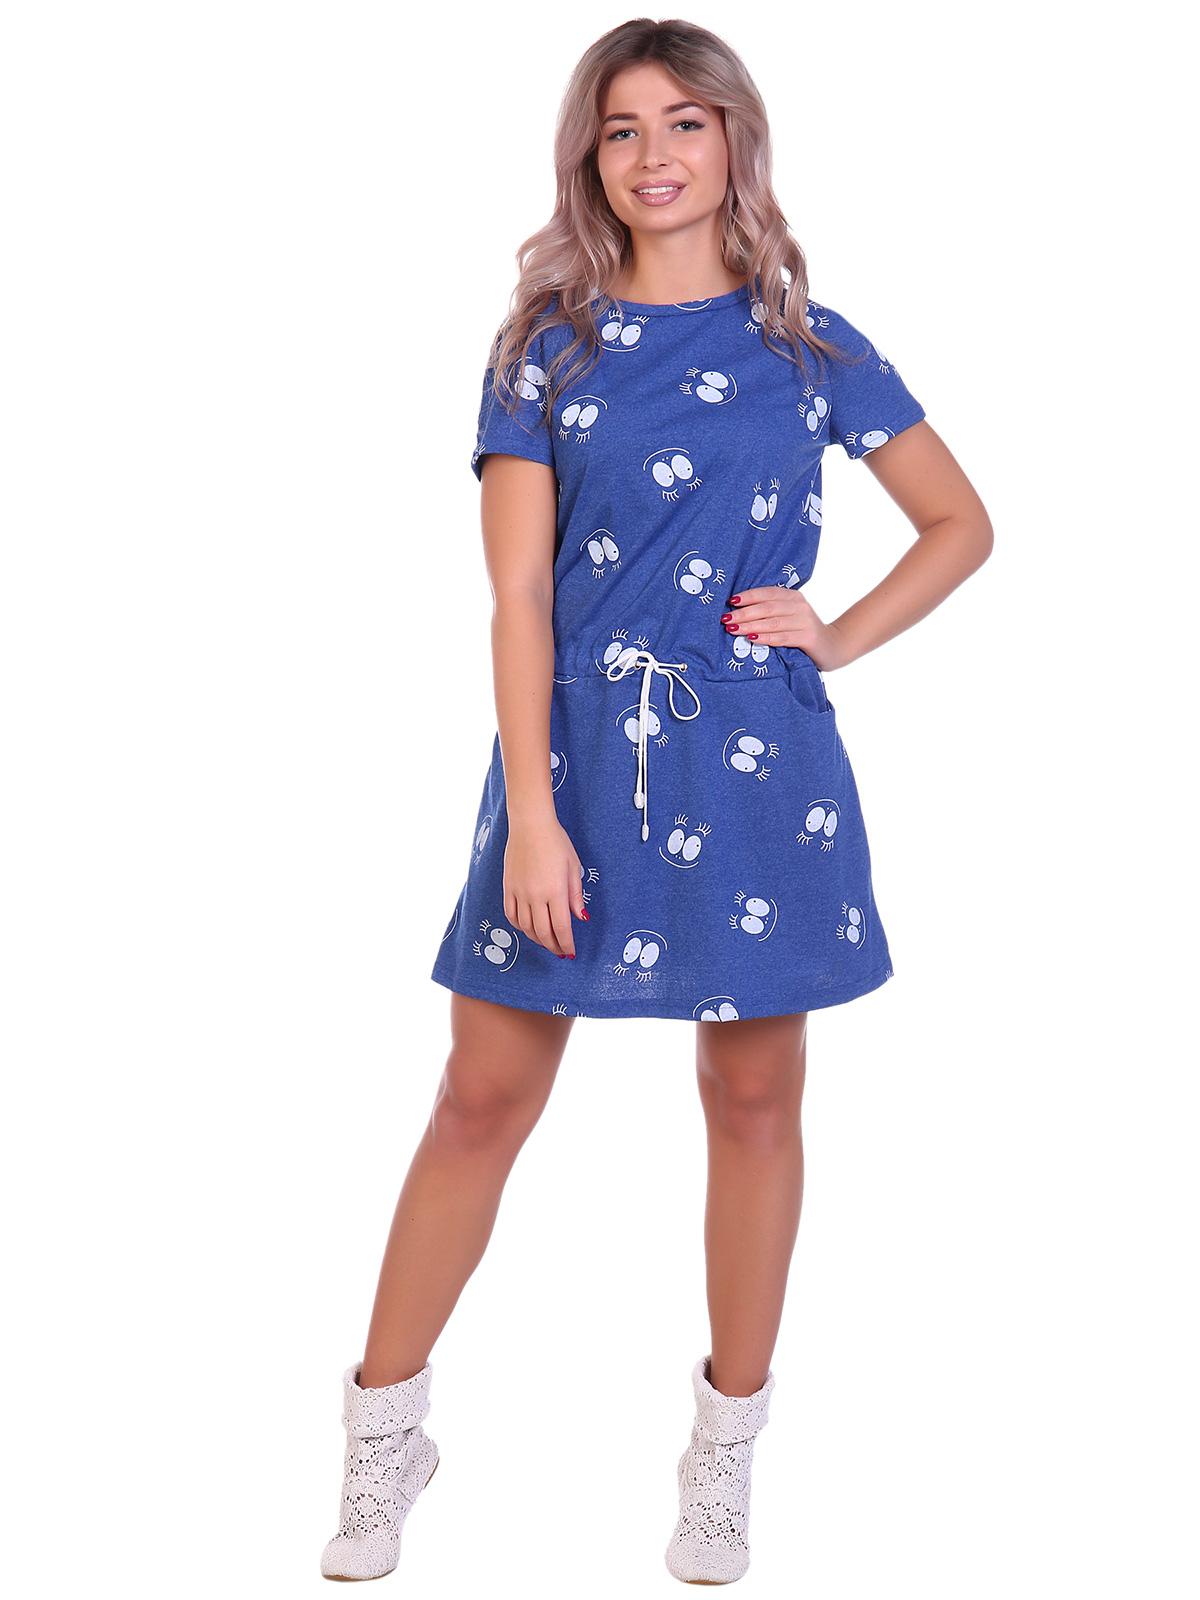 Жен. платье арт. 16-0694 Синий р. 48 фото